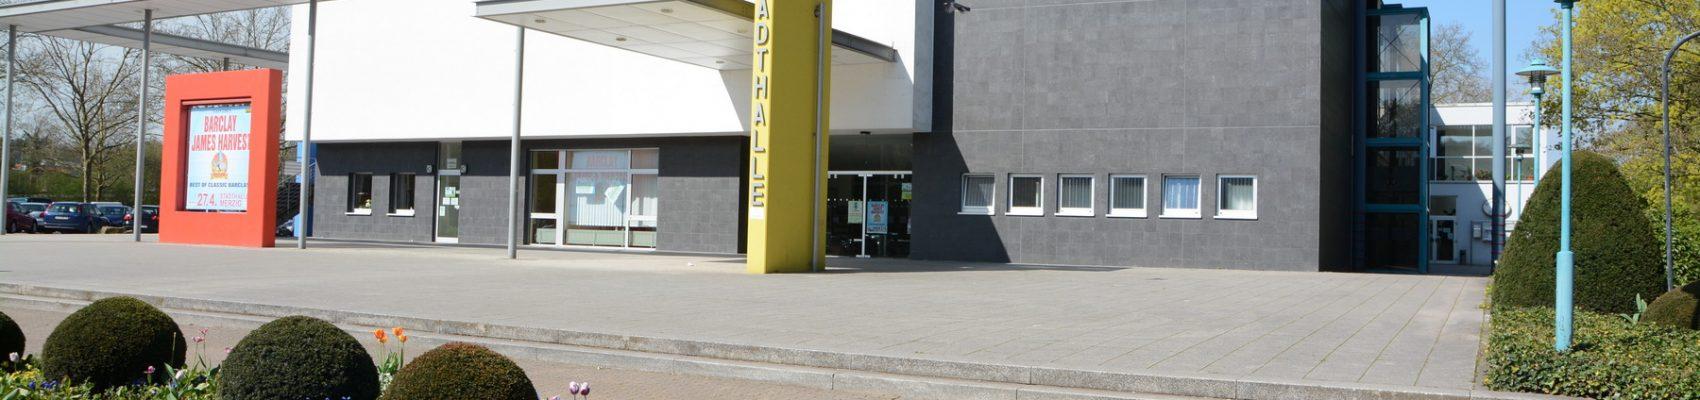 Stadthalle_Frontalansicht